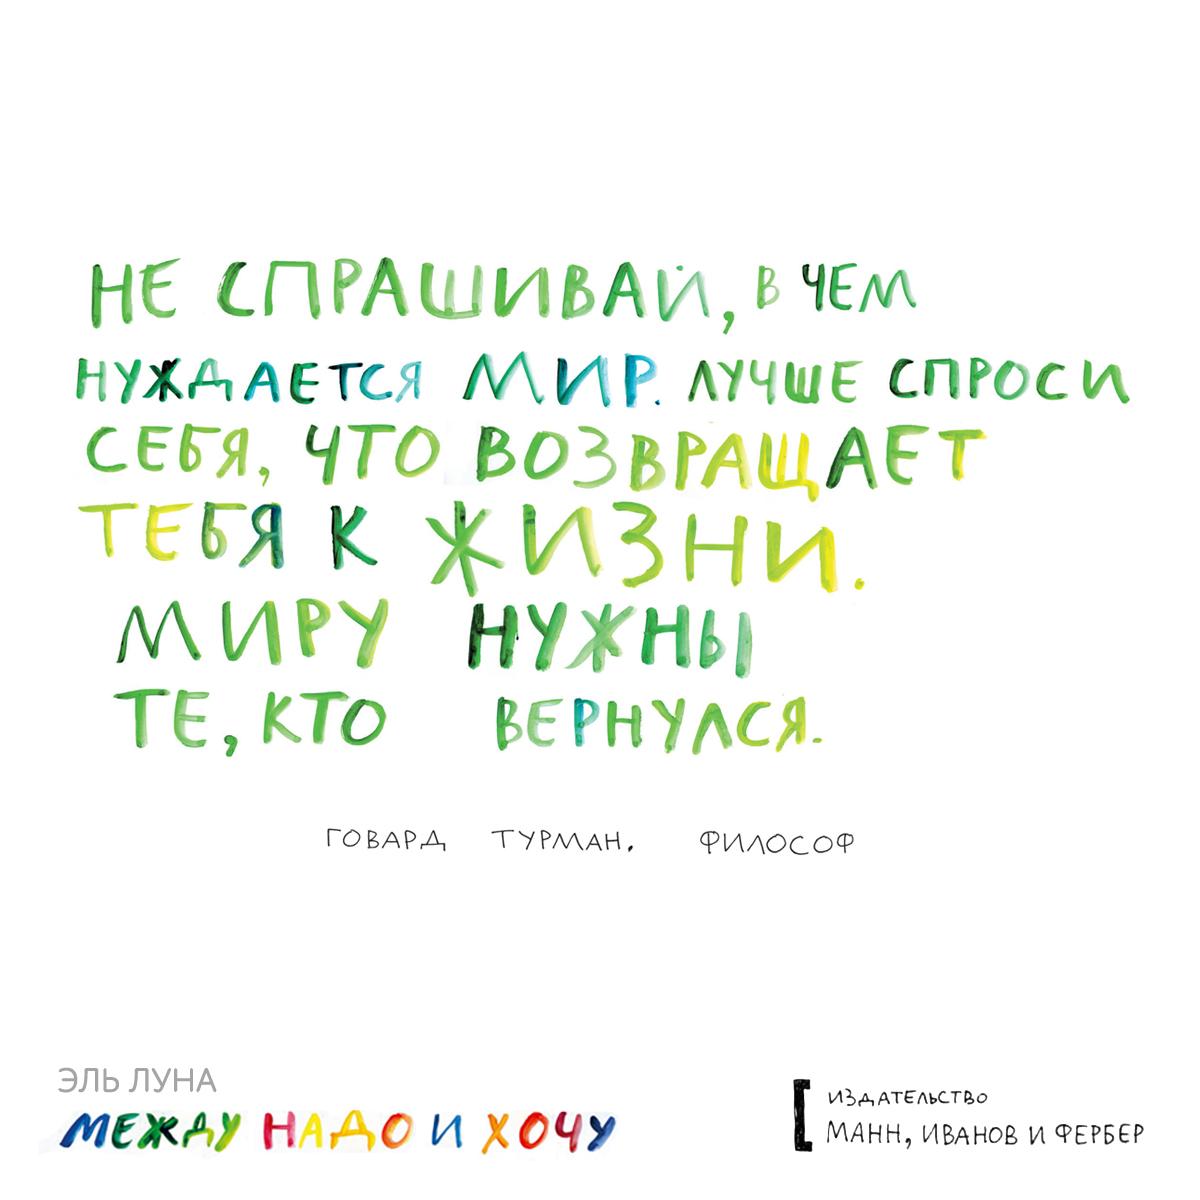 Открытка_Между_надо_1200Х1200_3 (1)